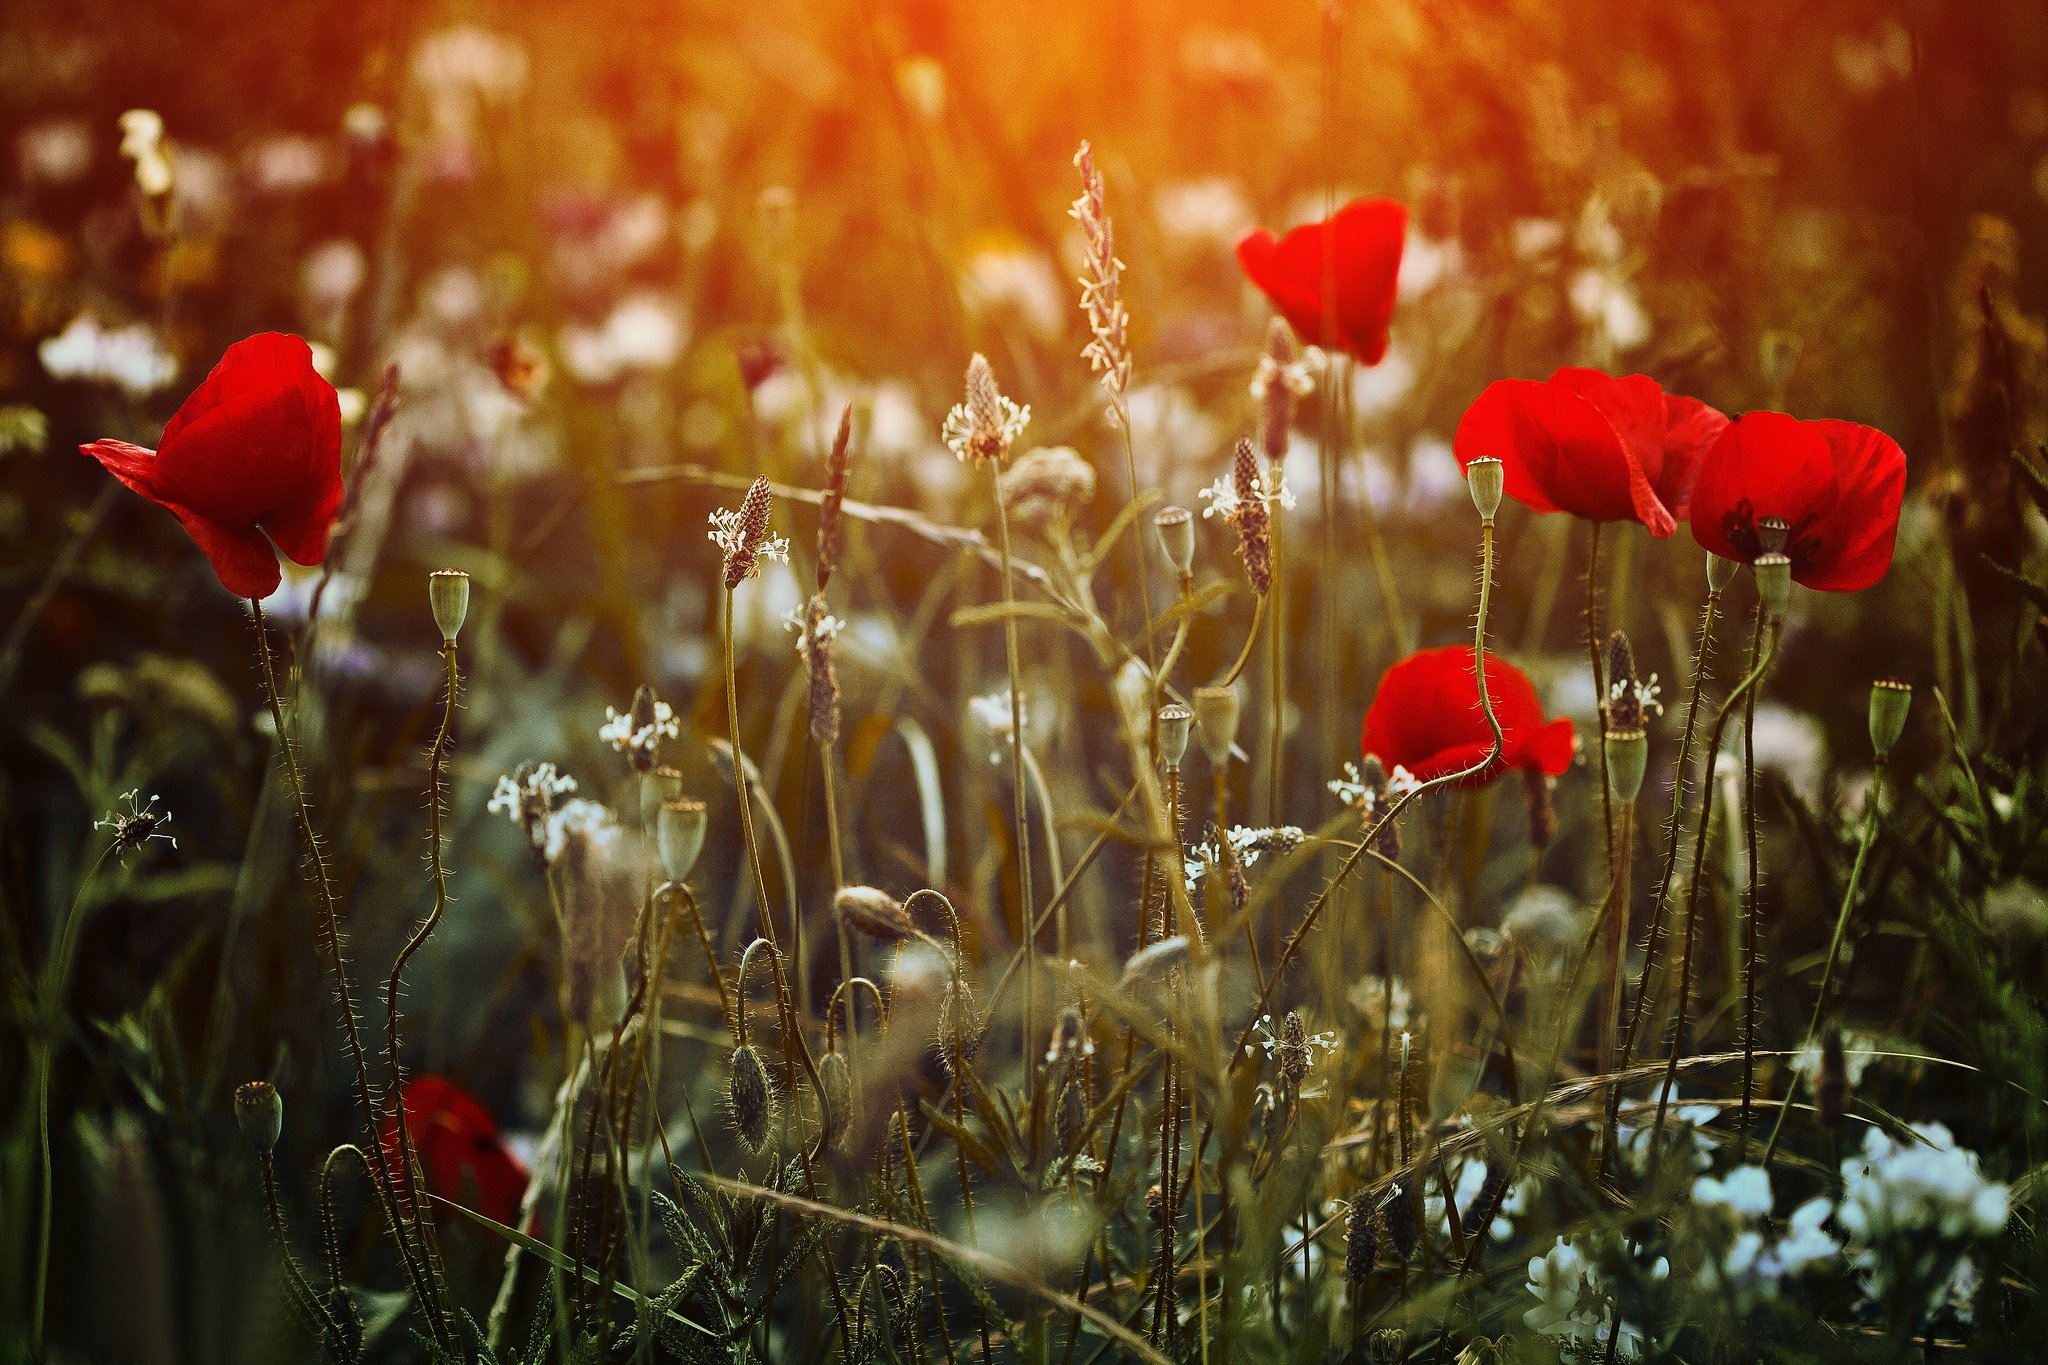 garden poppy poppies wallpaper 2048x1365 281759